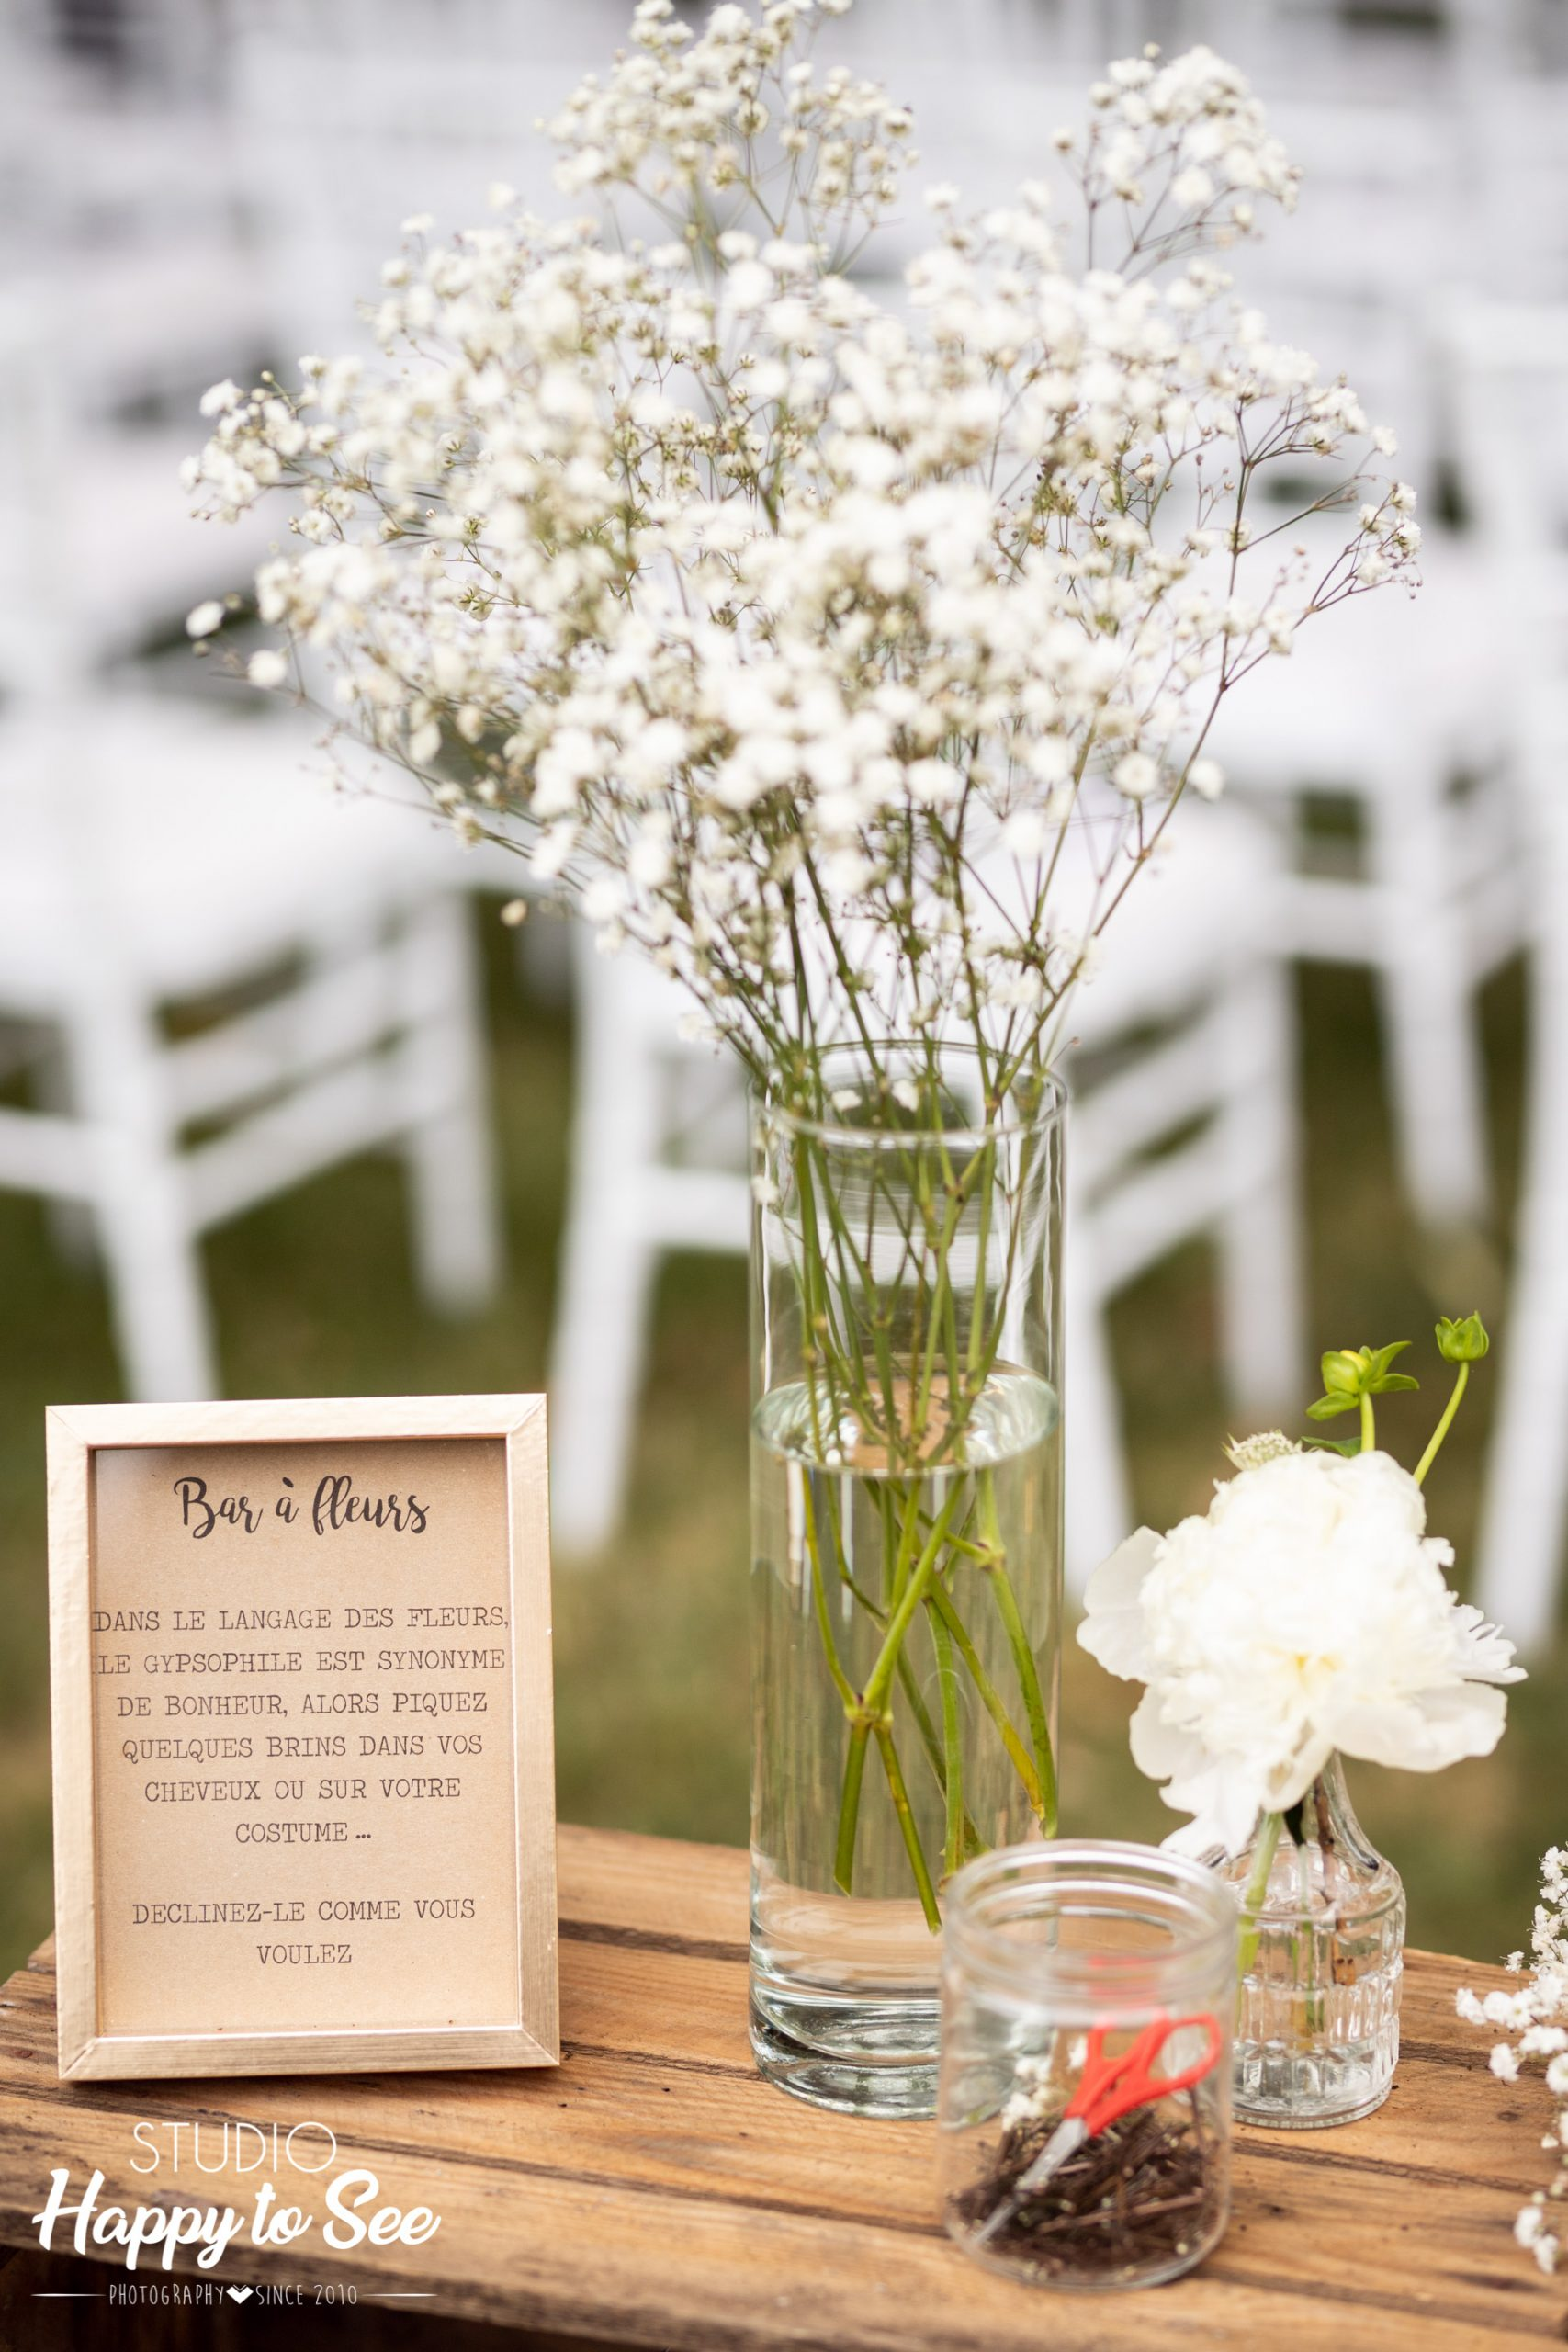 Mariage dans le Tarn Bar à fleurs